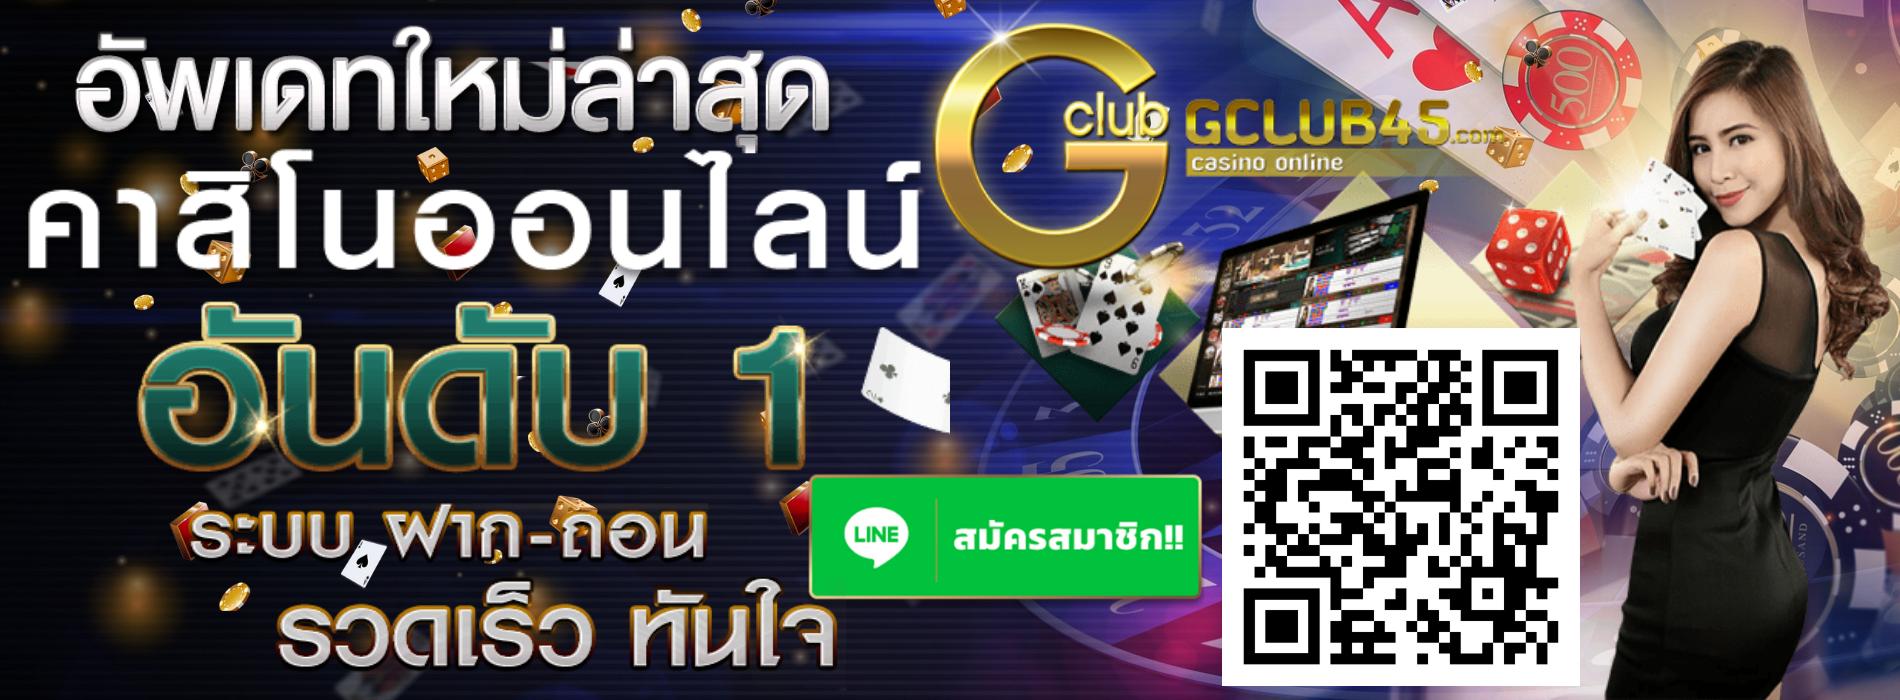 Gclub คาสิโนออนไลน์ อันดับ 1